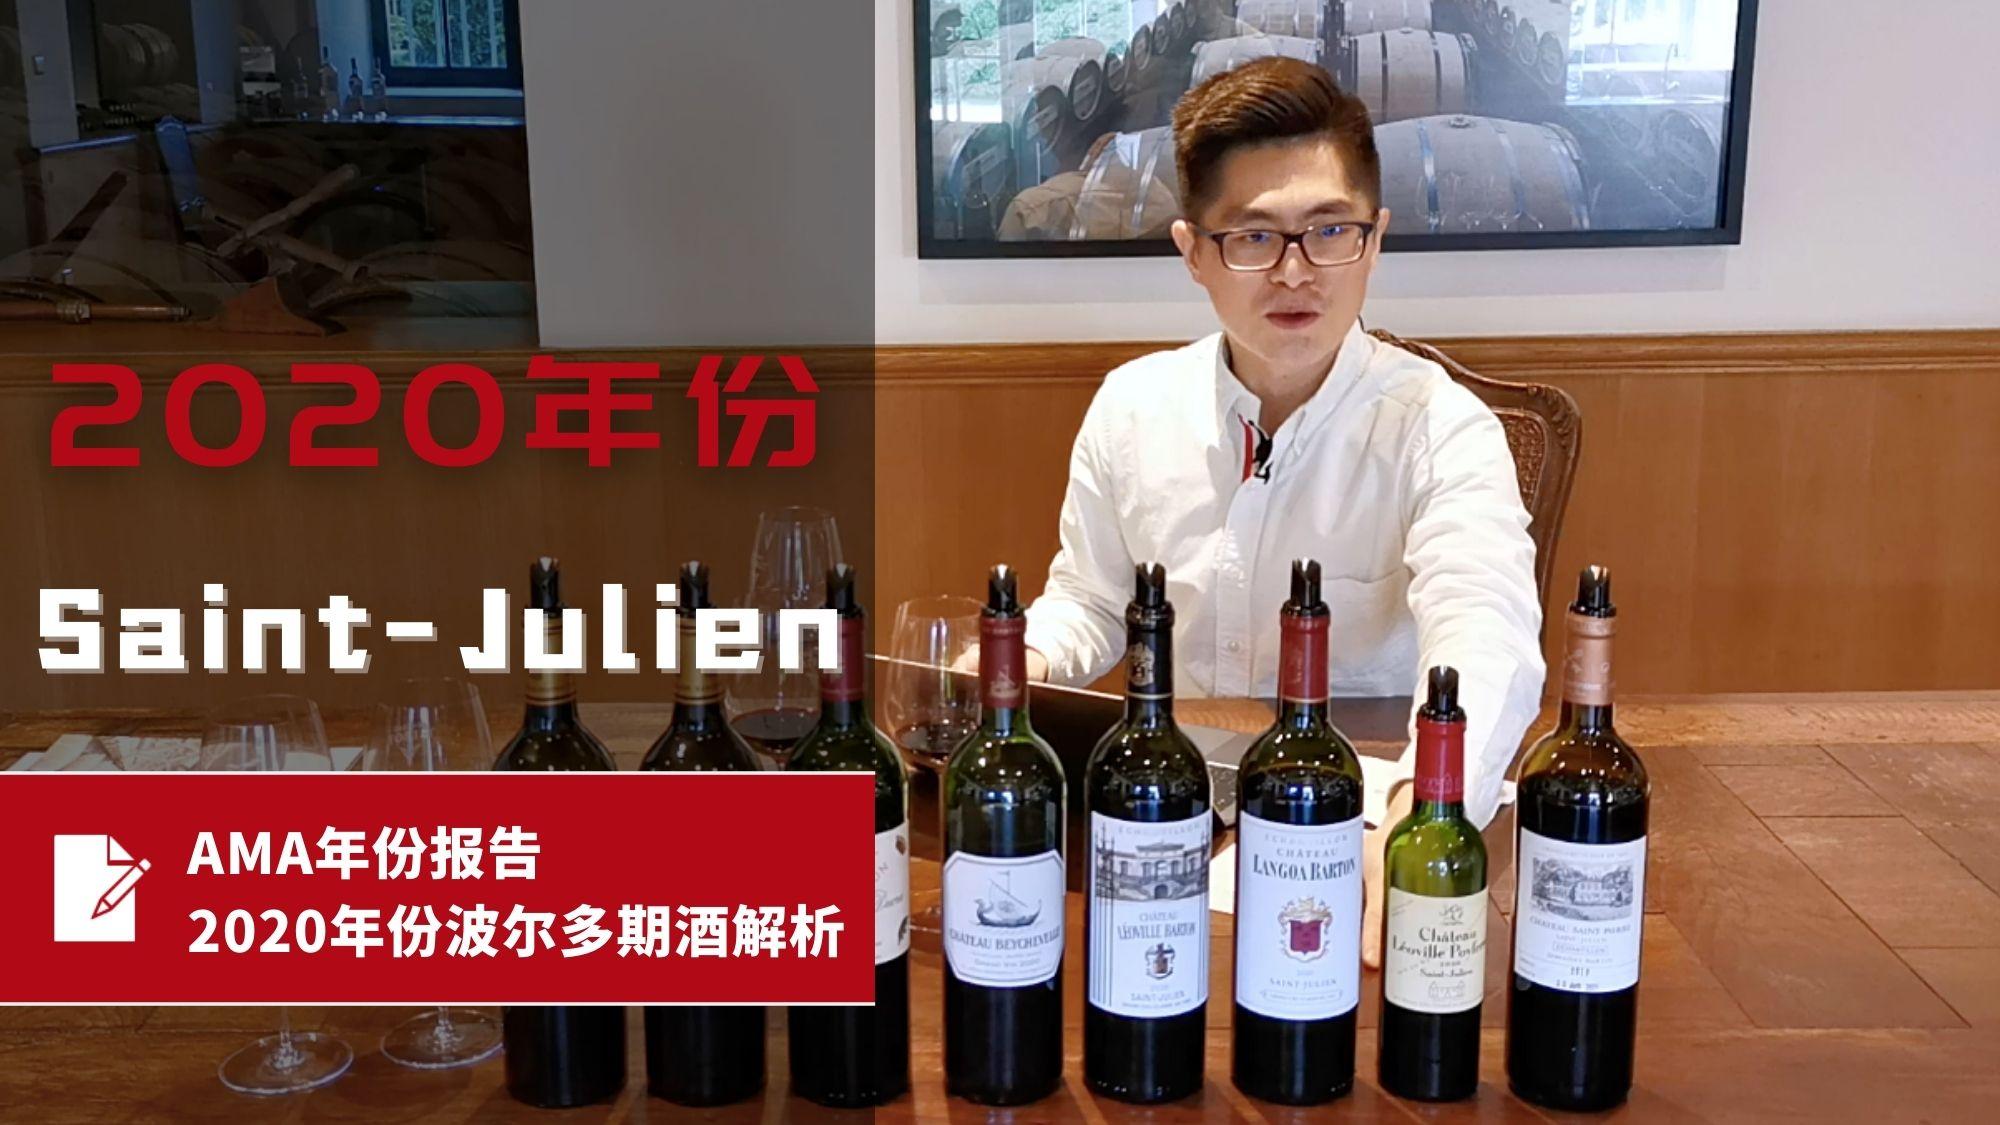 AMA年份报告 – 2020年份波尔多波期酒解析 – Saint-Julien 圣朱利安 – CN - Alexandre Ma